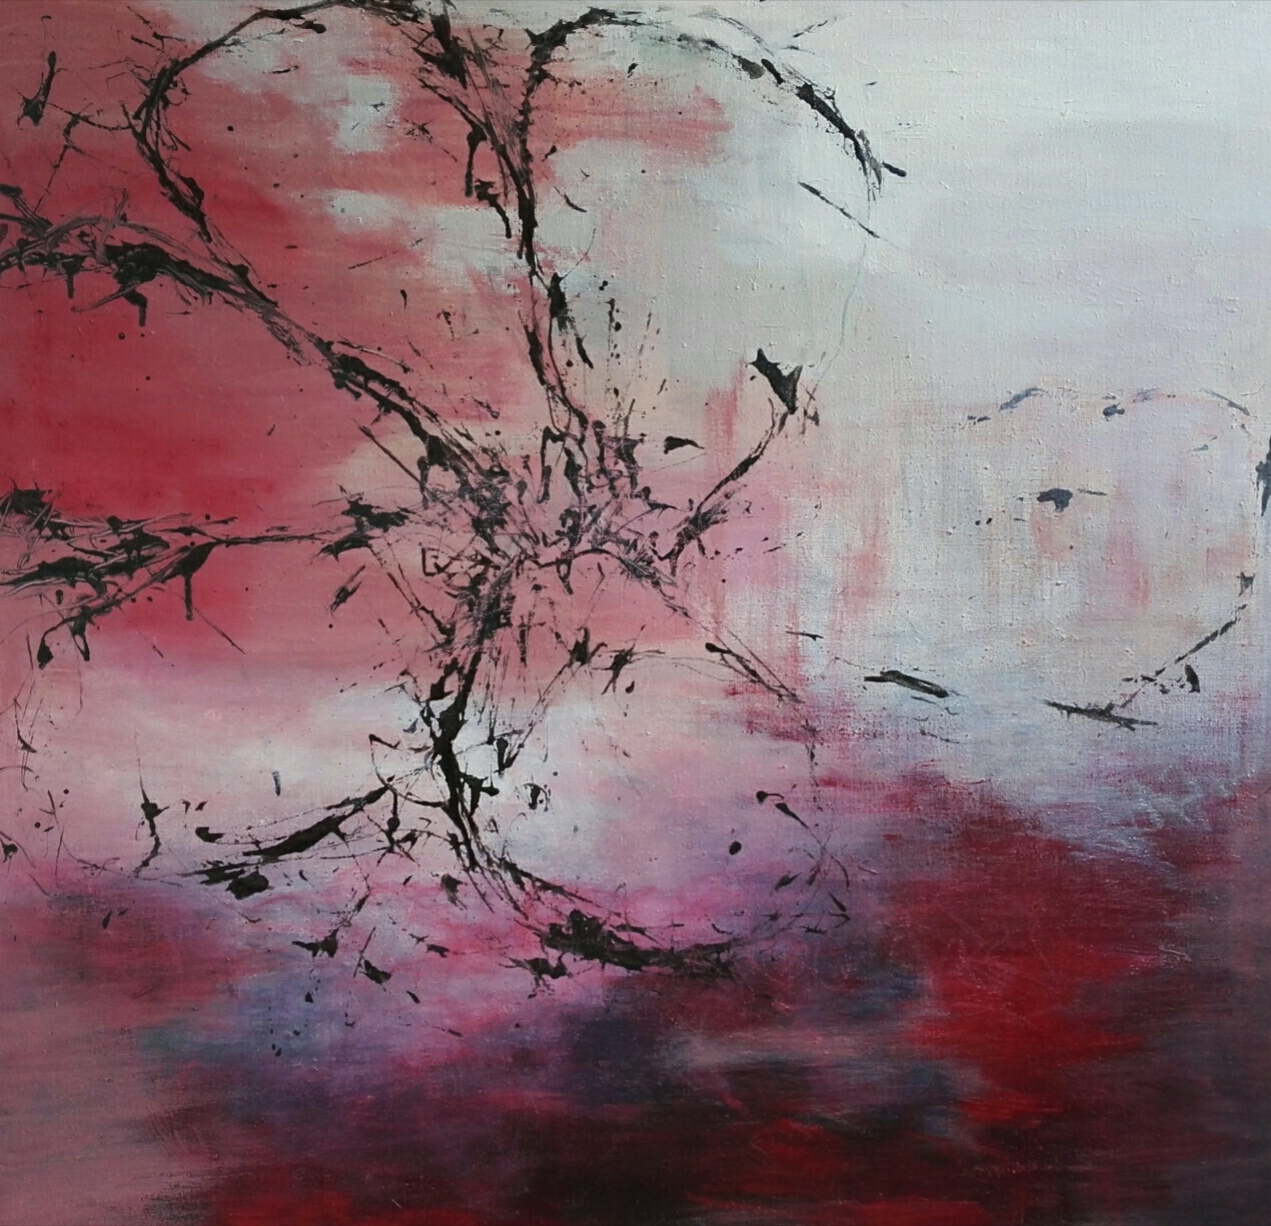 Deep river, 100 x 100